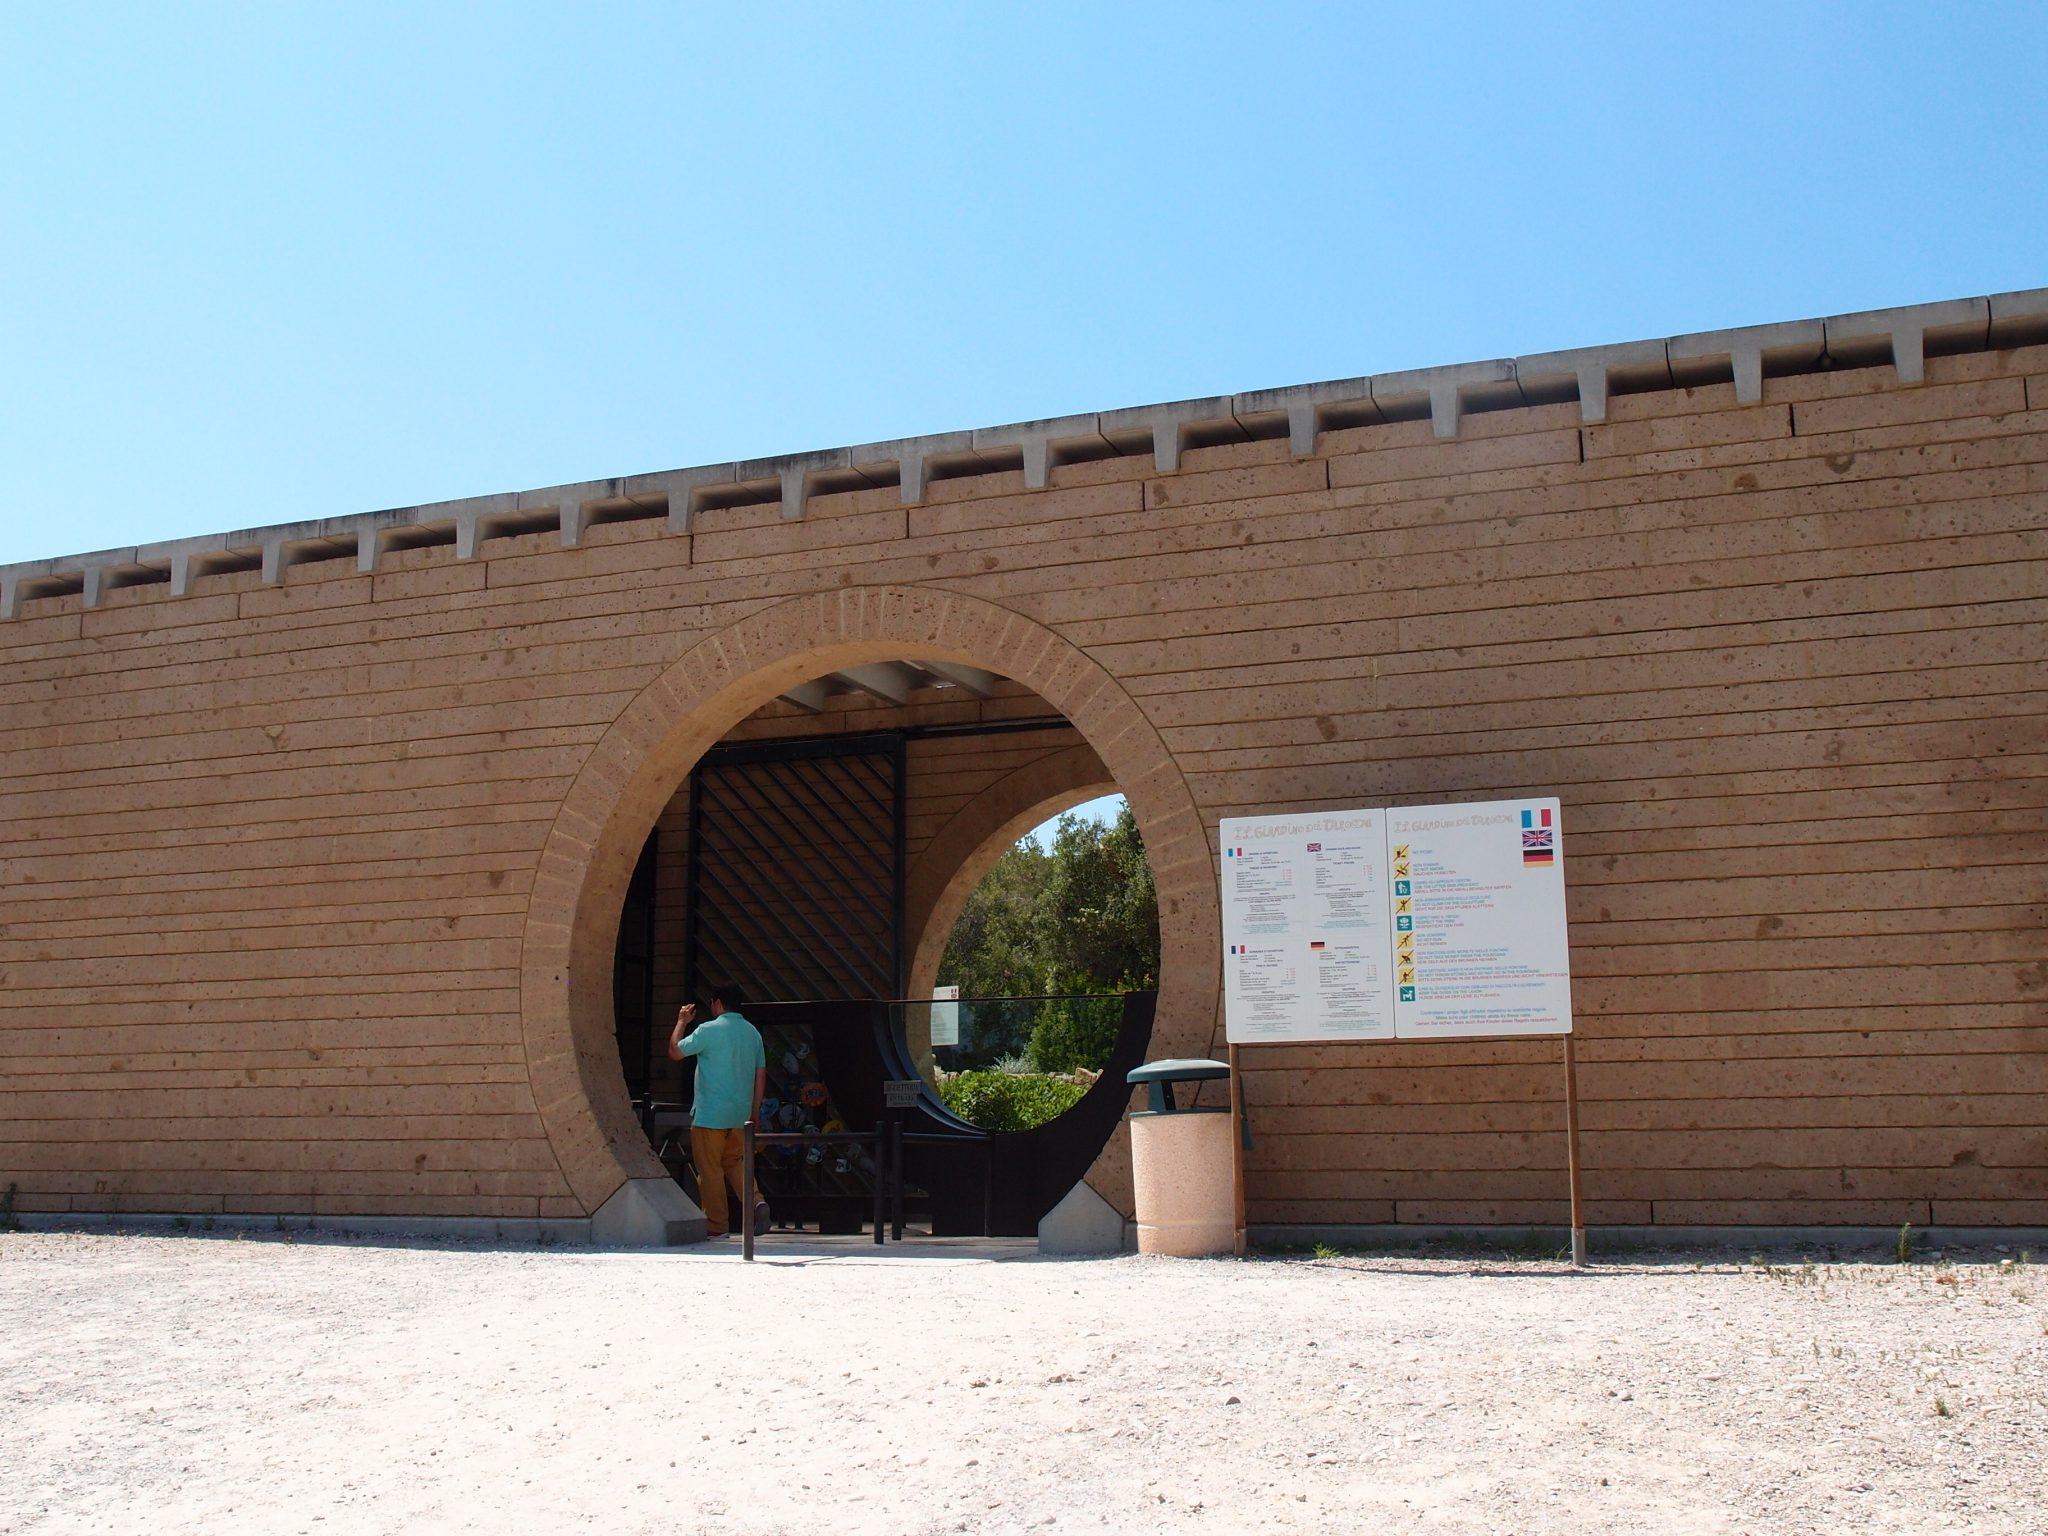 Entrance Gate, designed by Mario Botta.